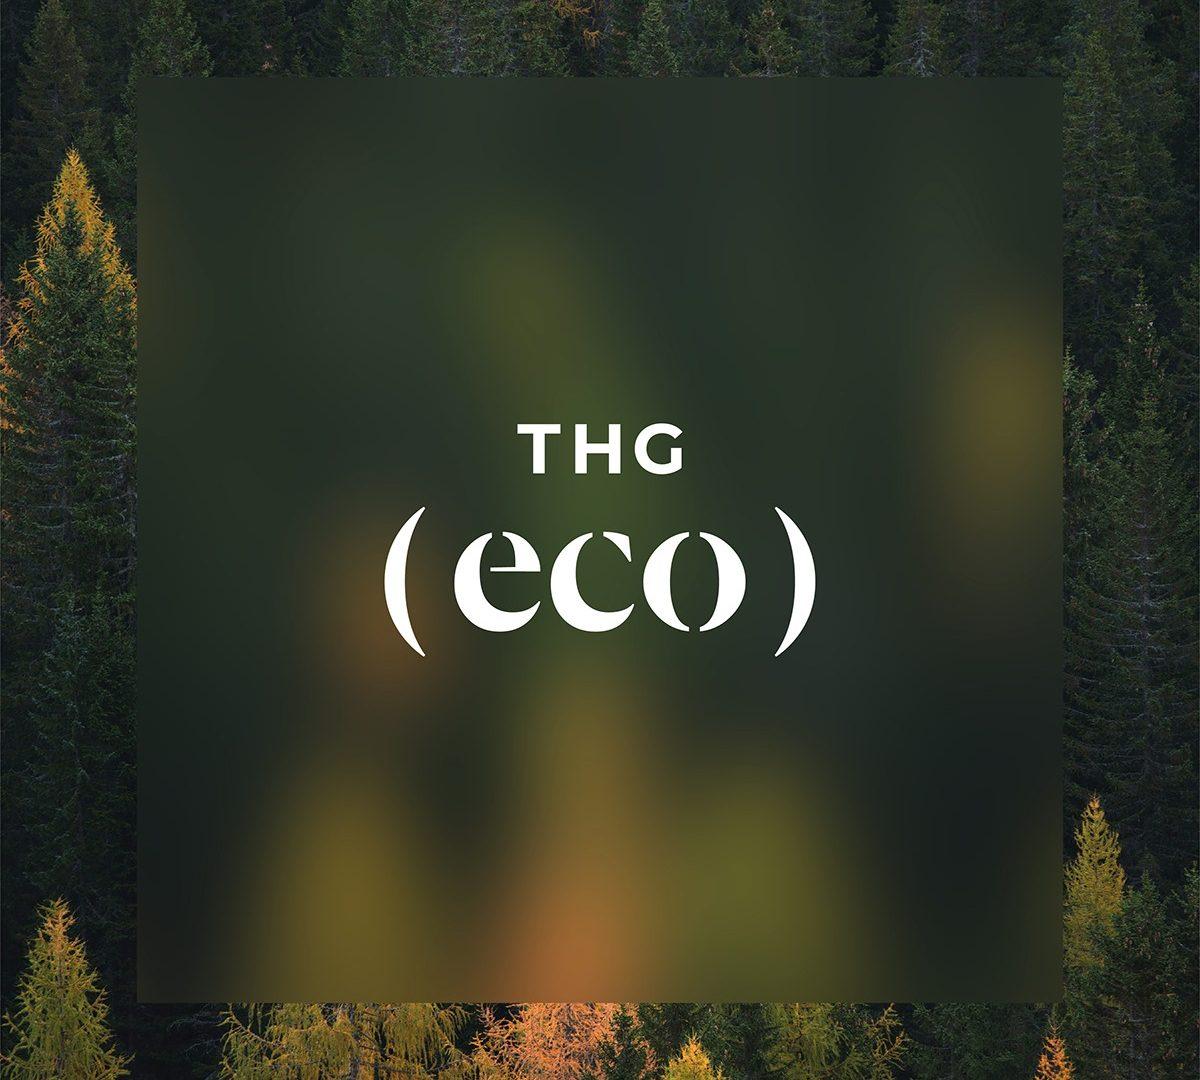 THG Eco announcement